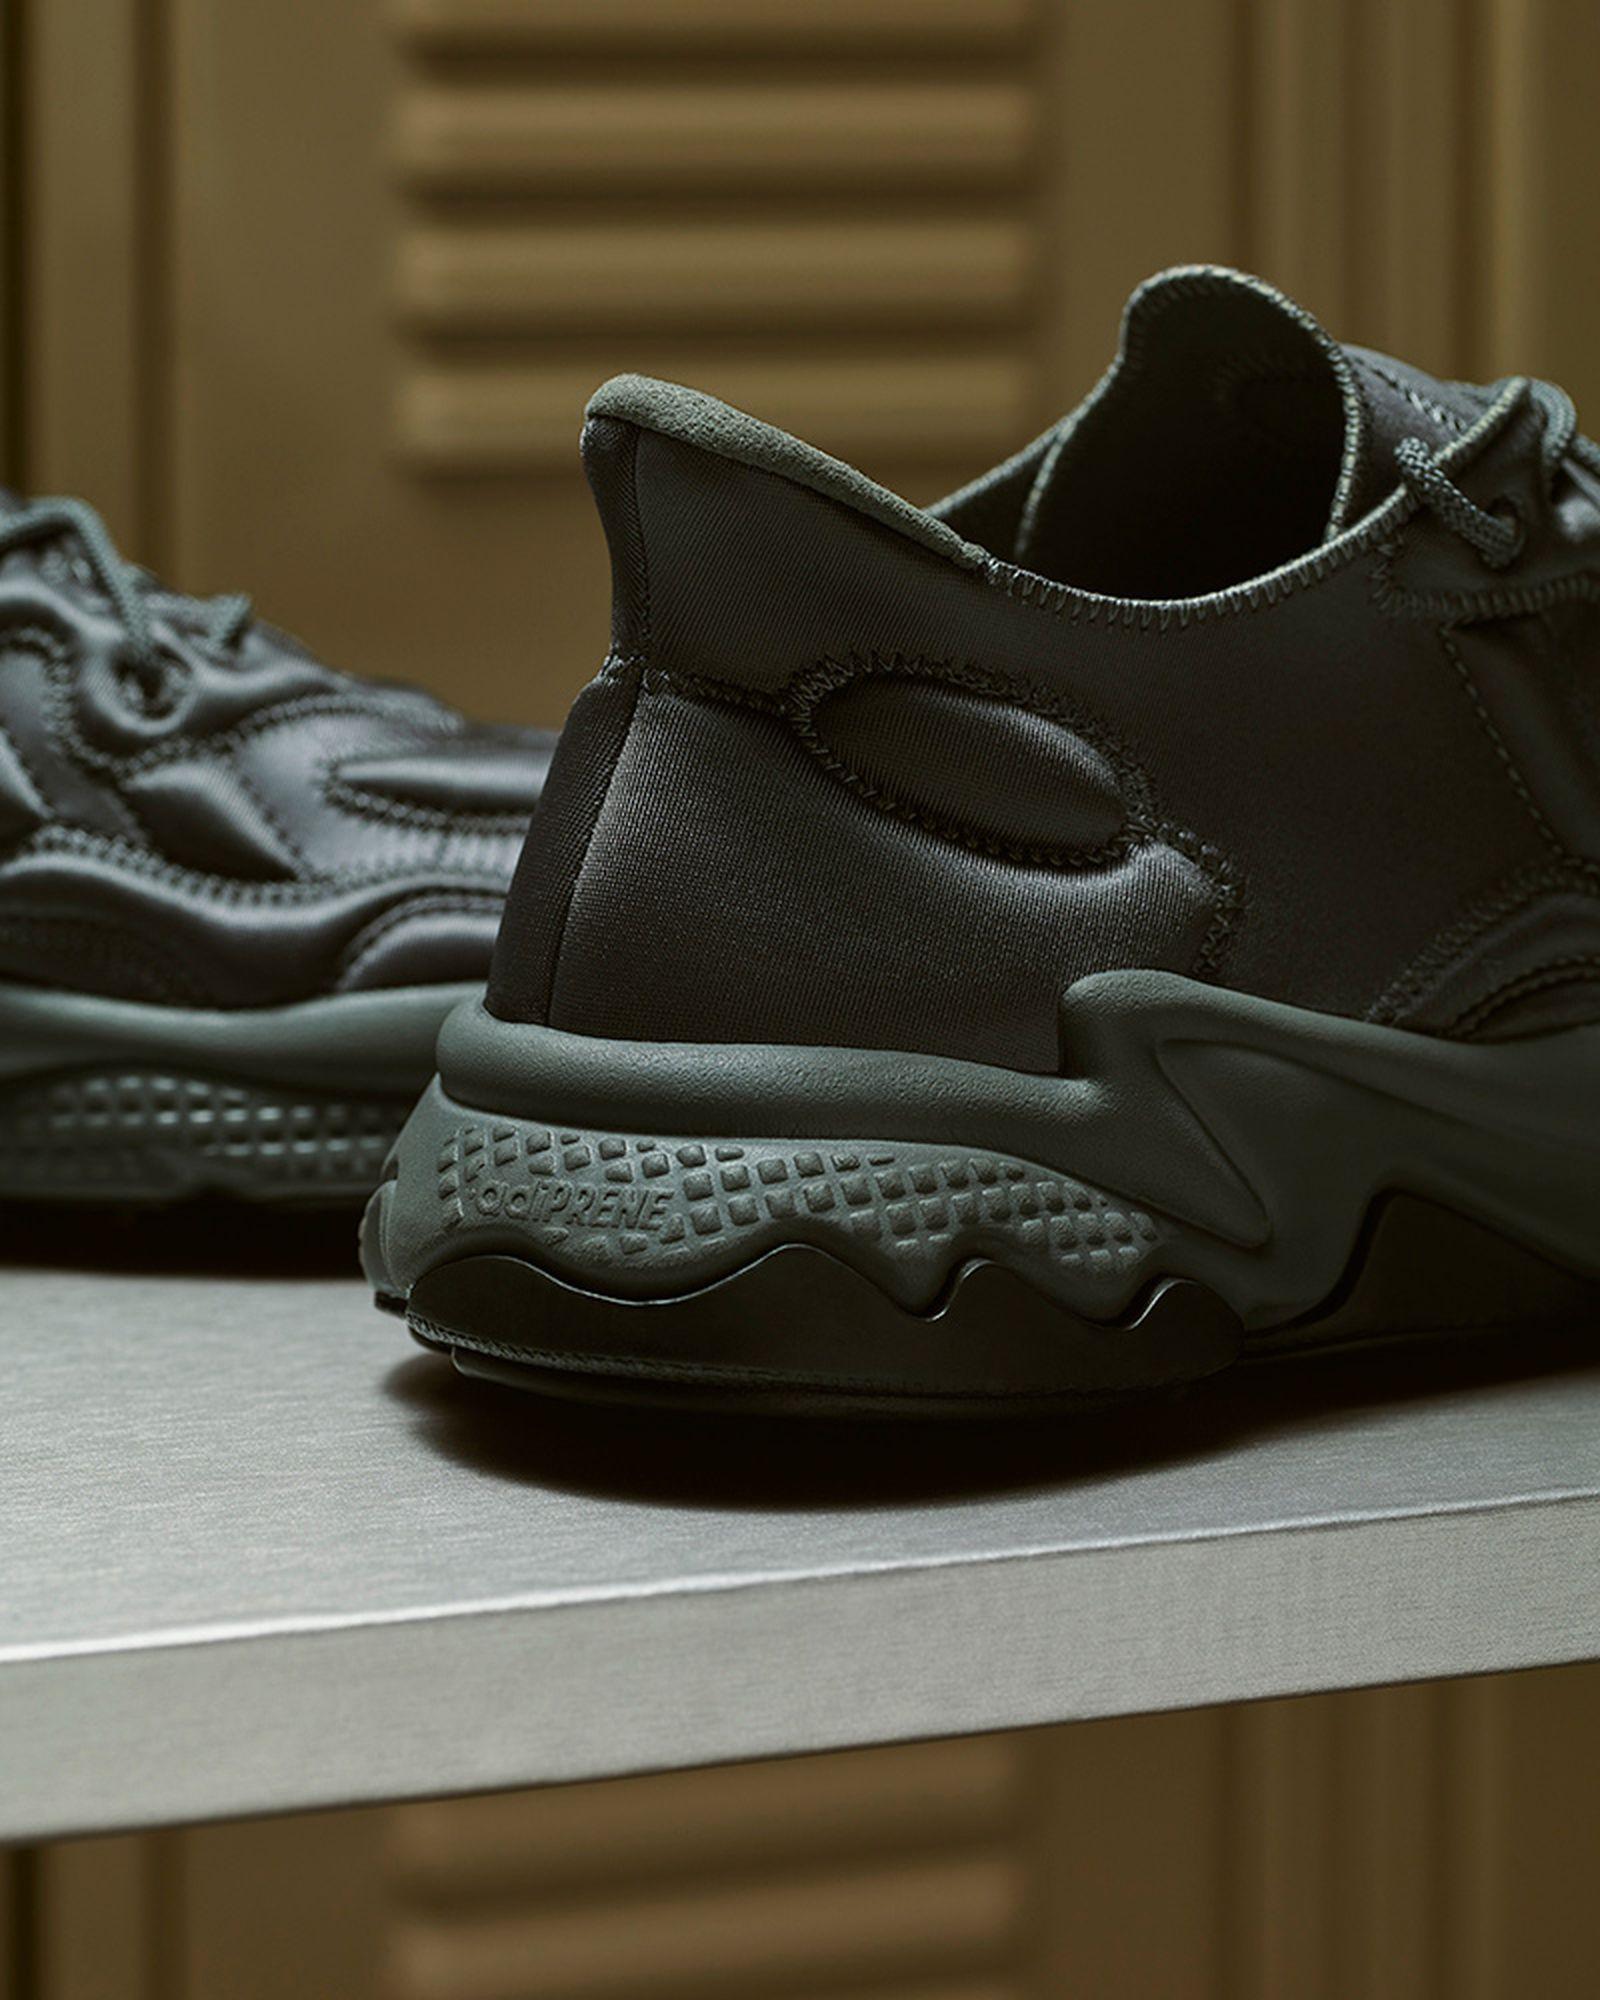 adidas-originals-ozweego-tech-moon-landing-release-date-price-03